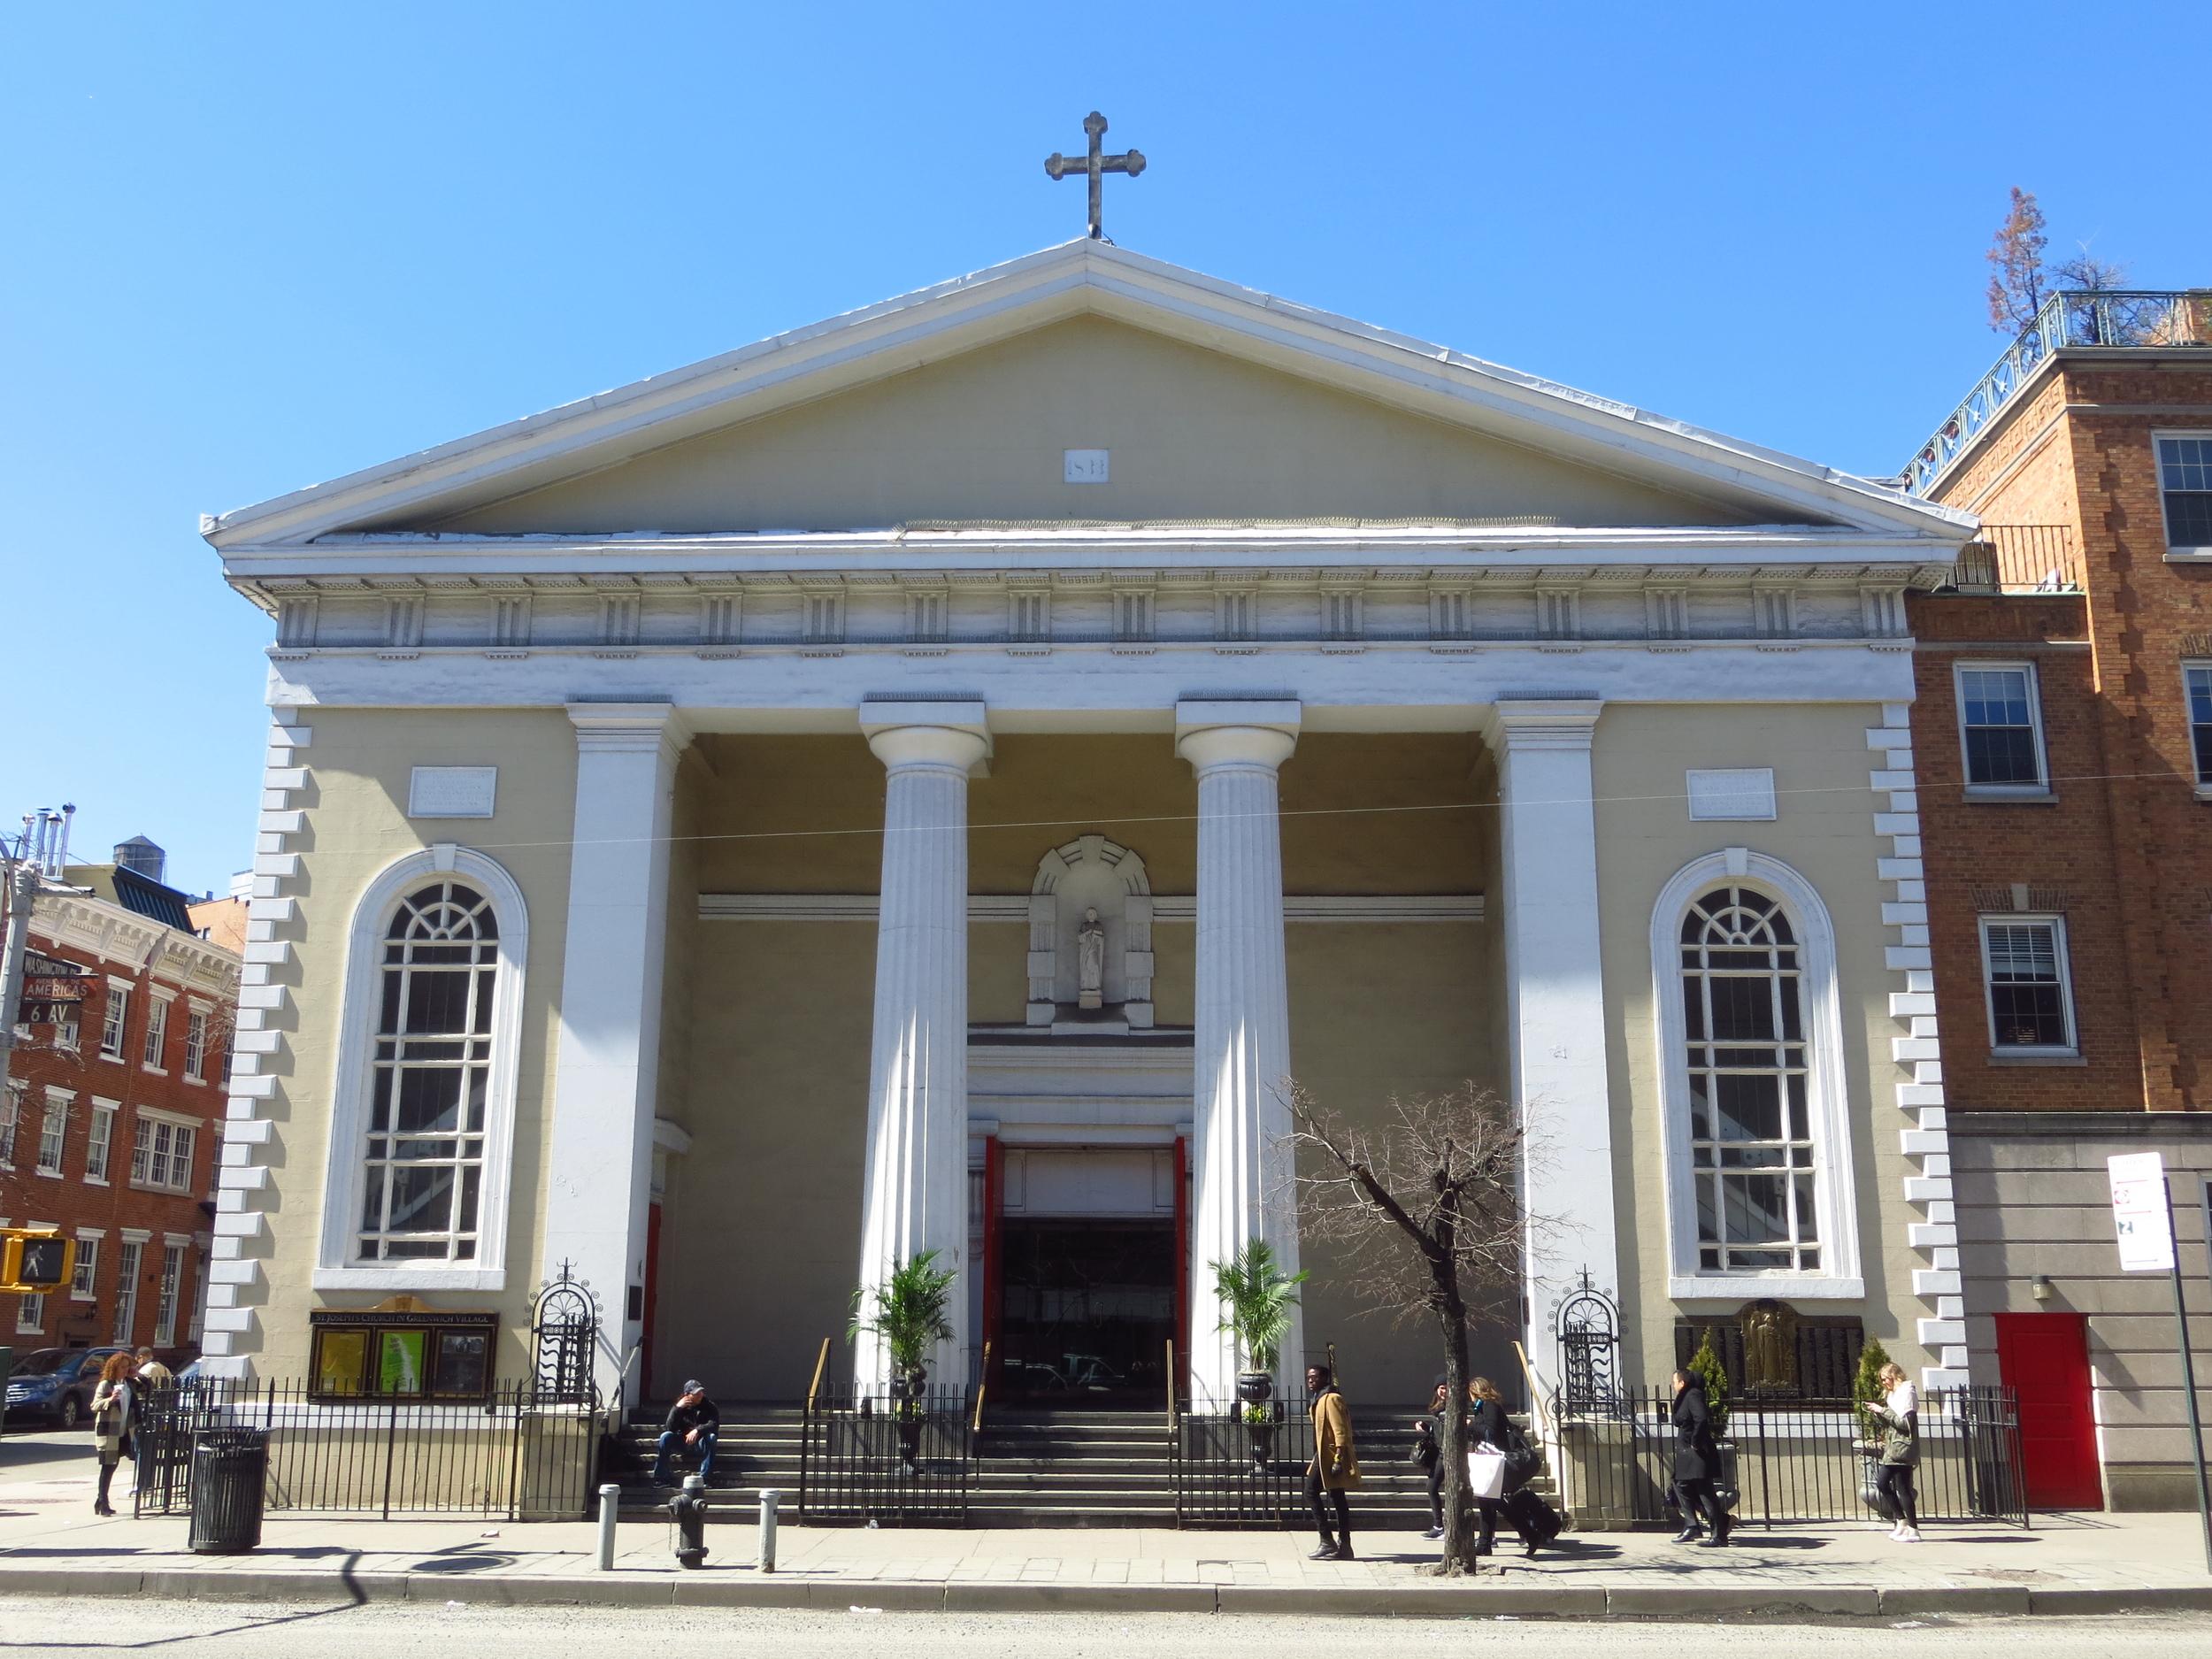 St. Joseph's Church in Greenwich Village